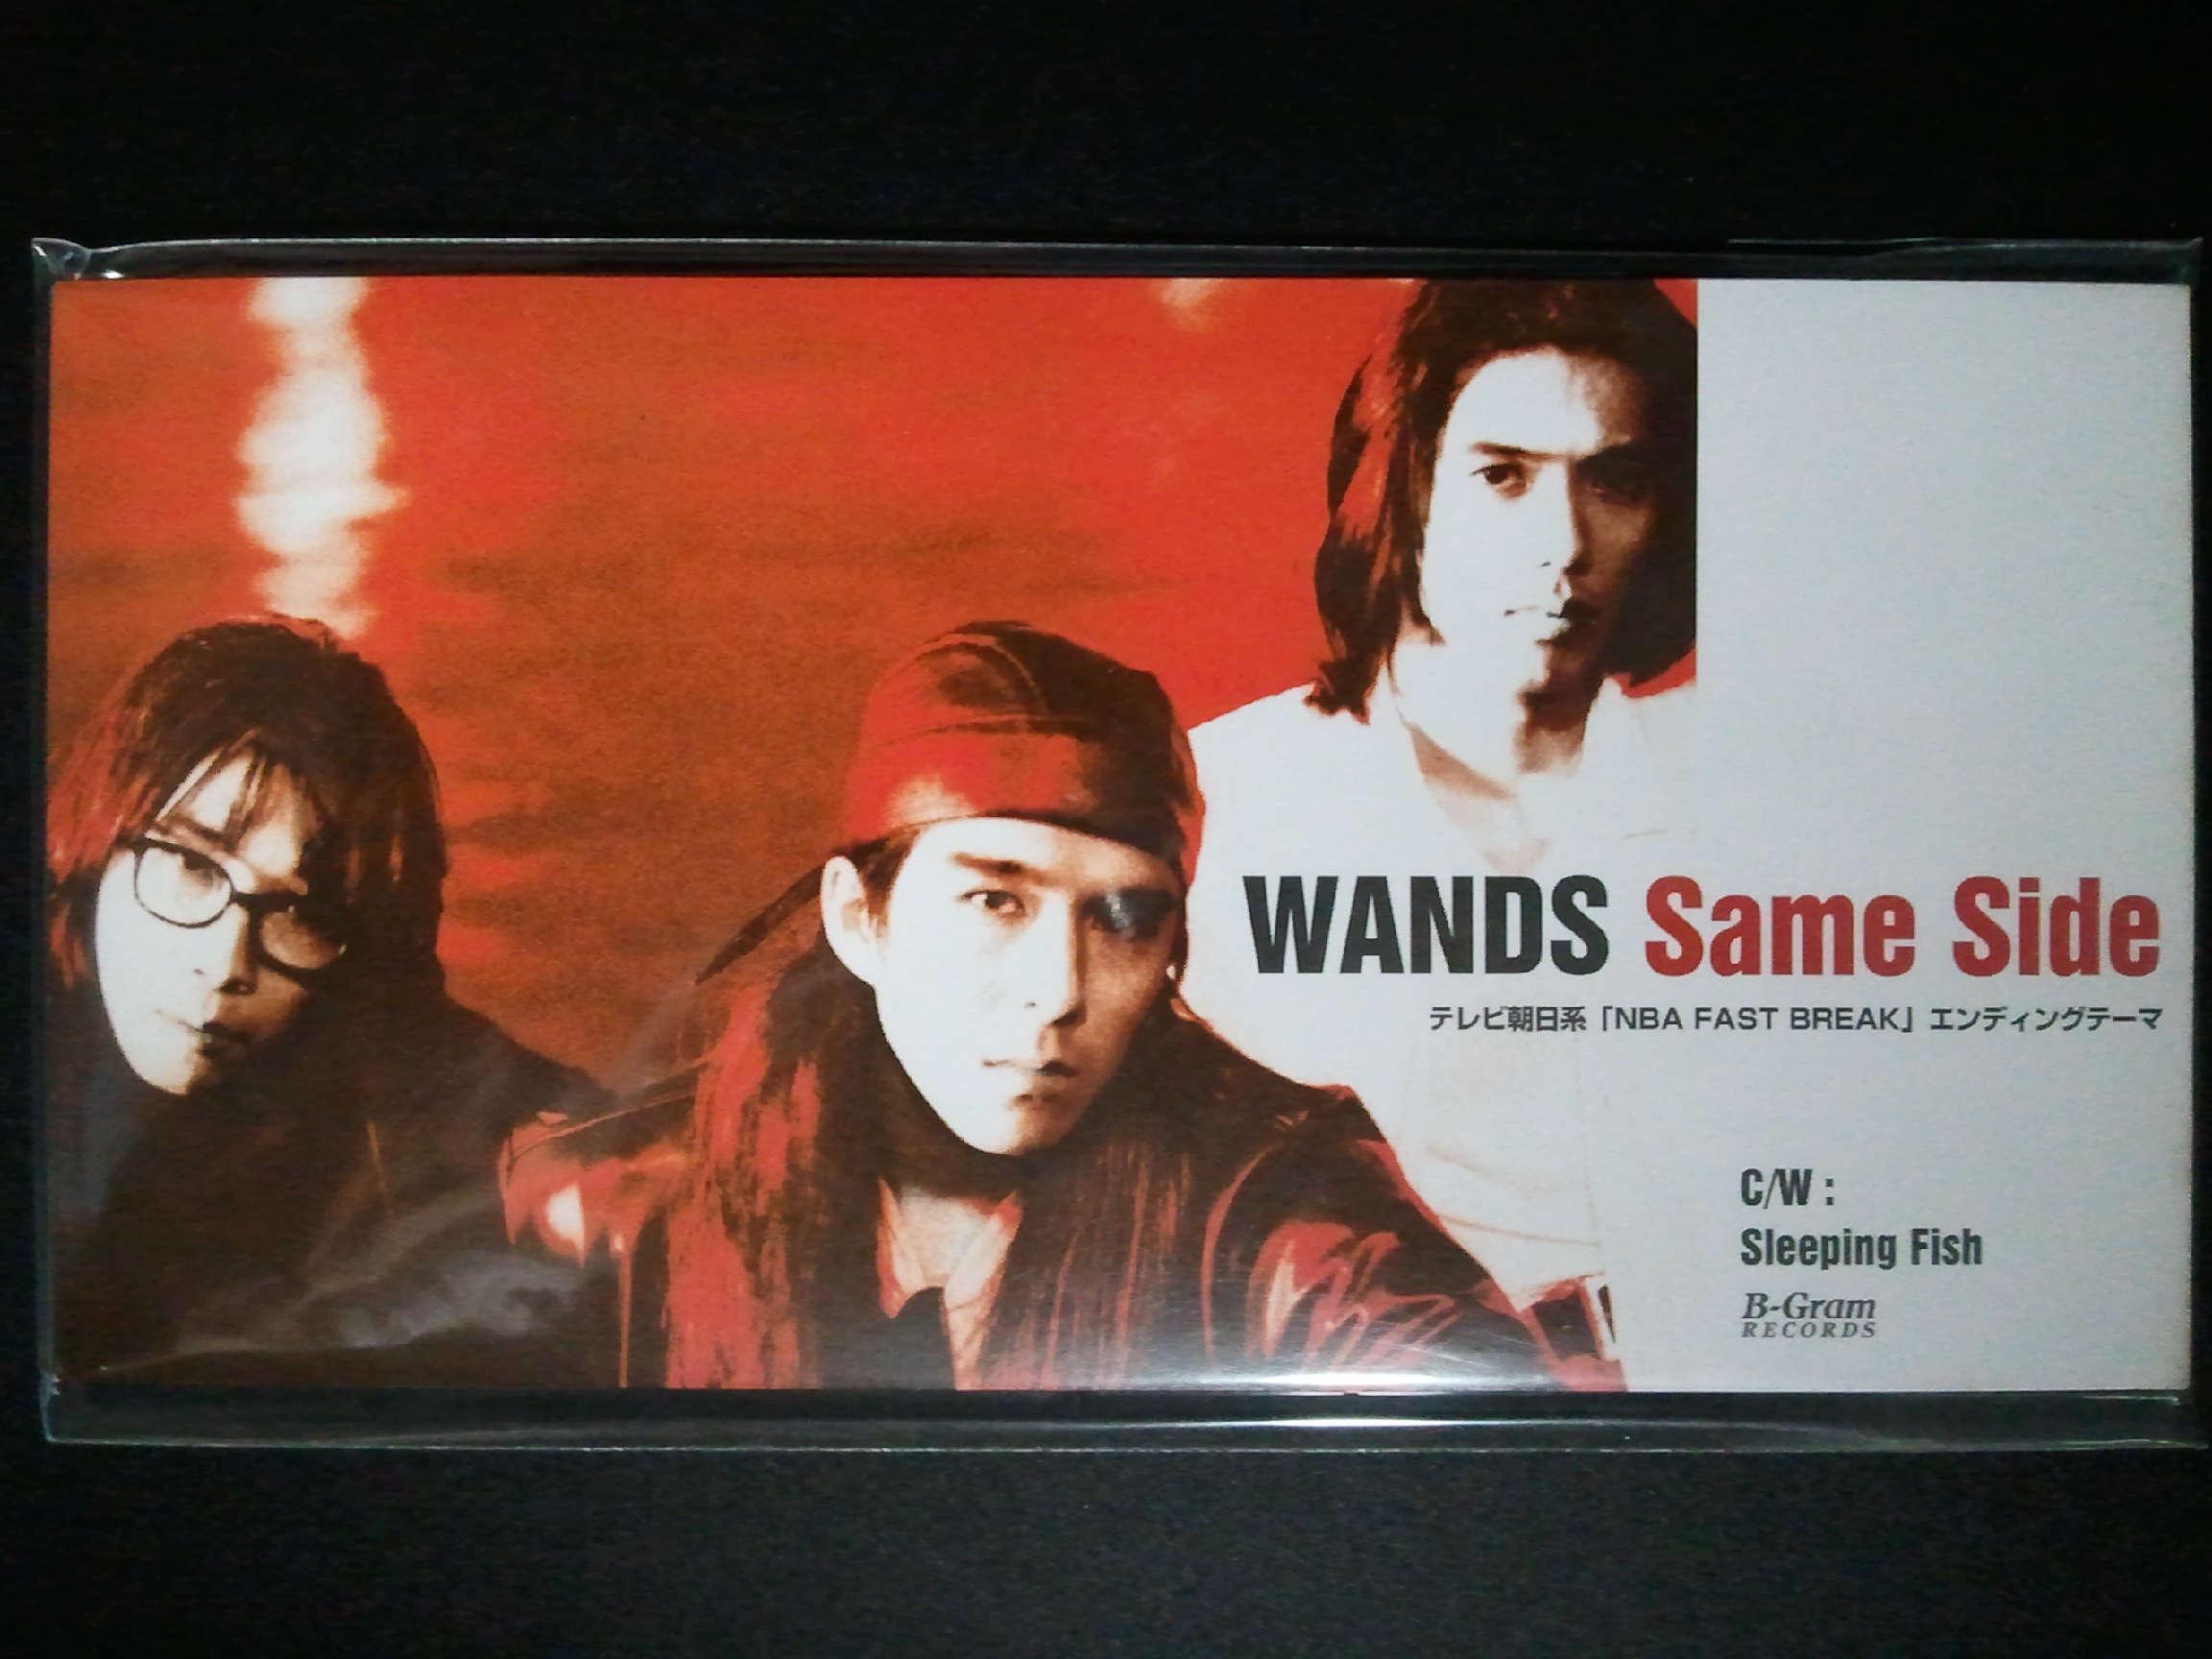 WANDS Same Side